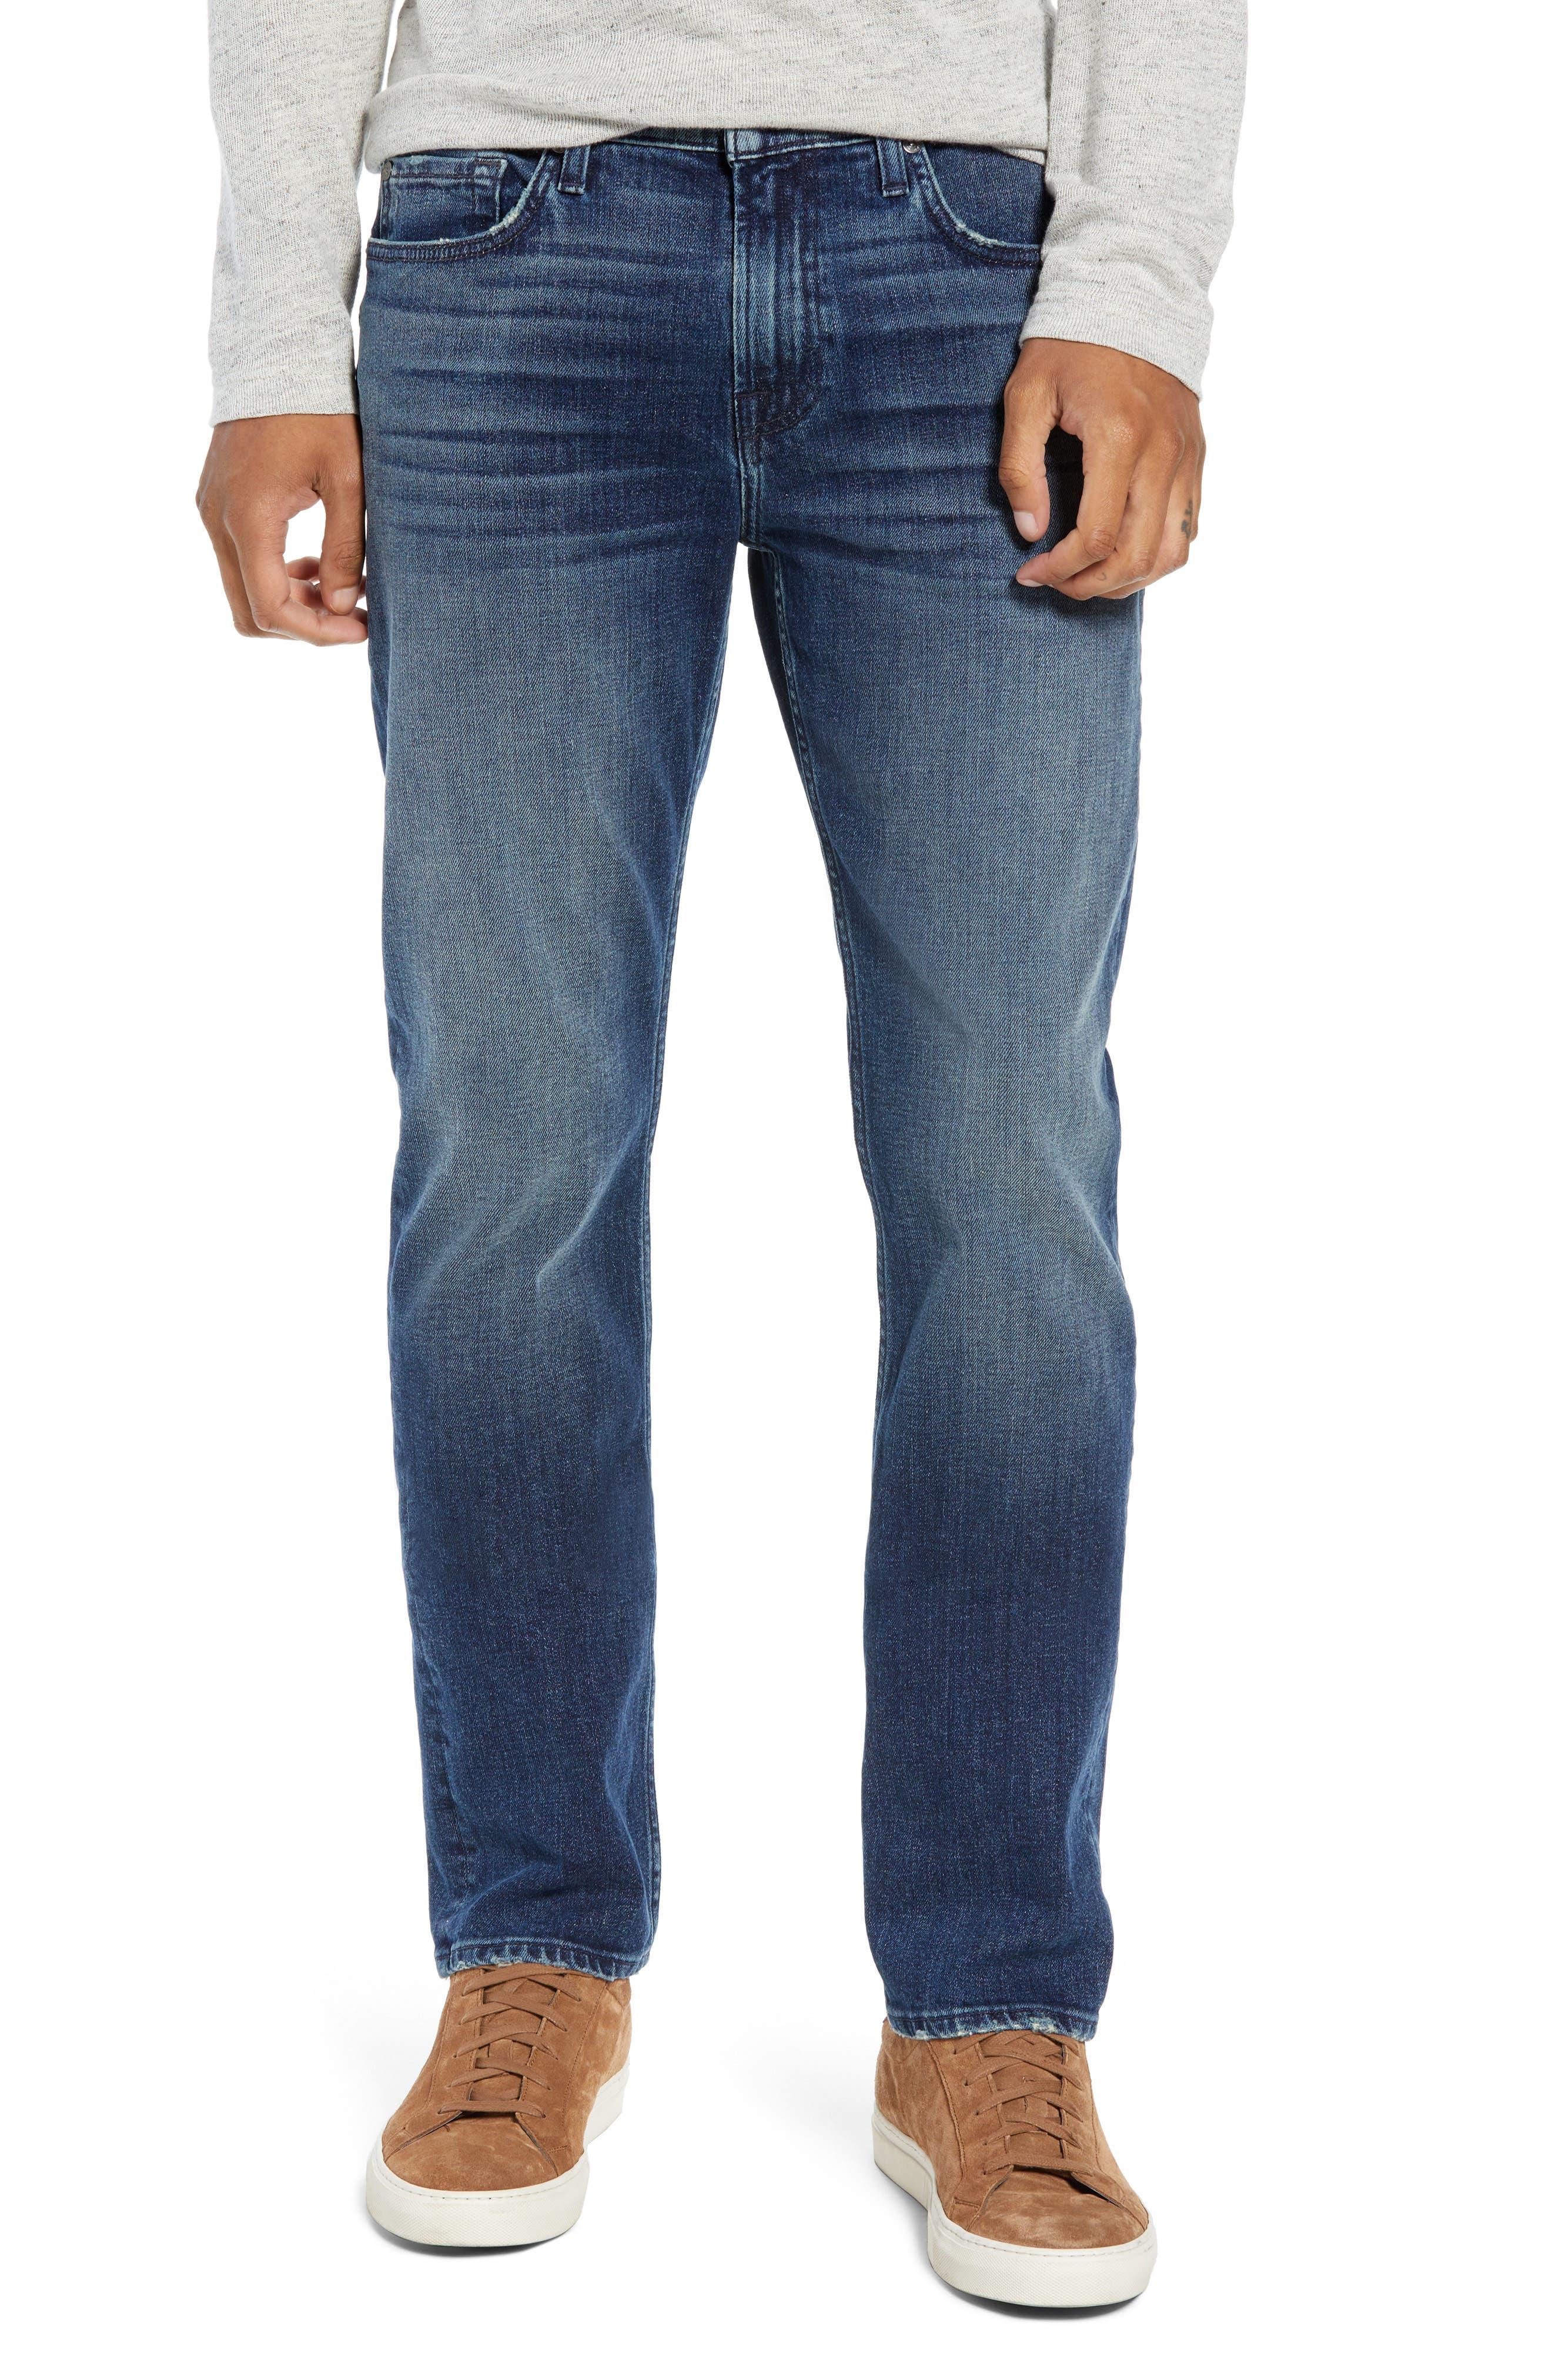 Slimmy Slim Fit Jeans,                         Main,                         color, DRIFTER